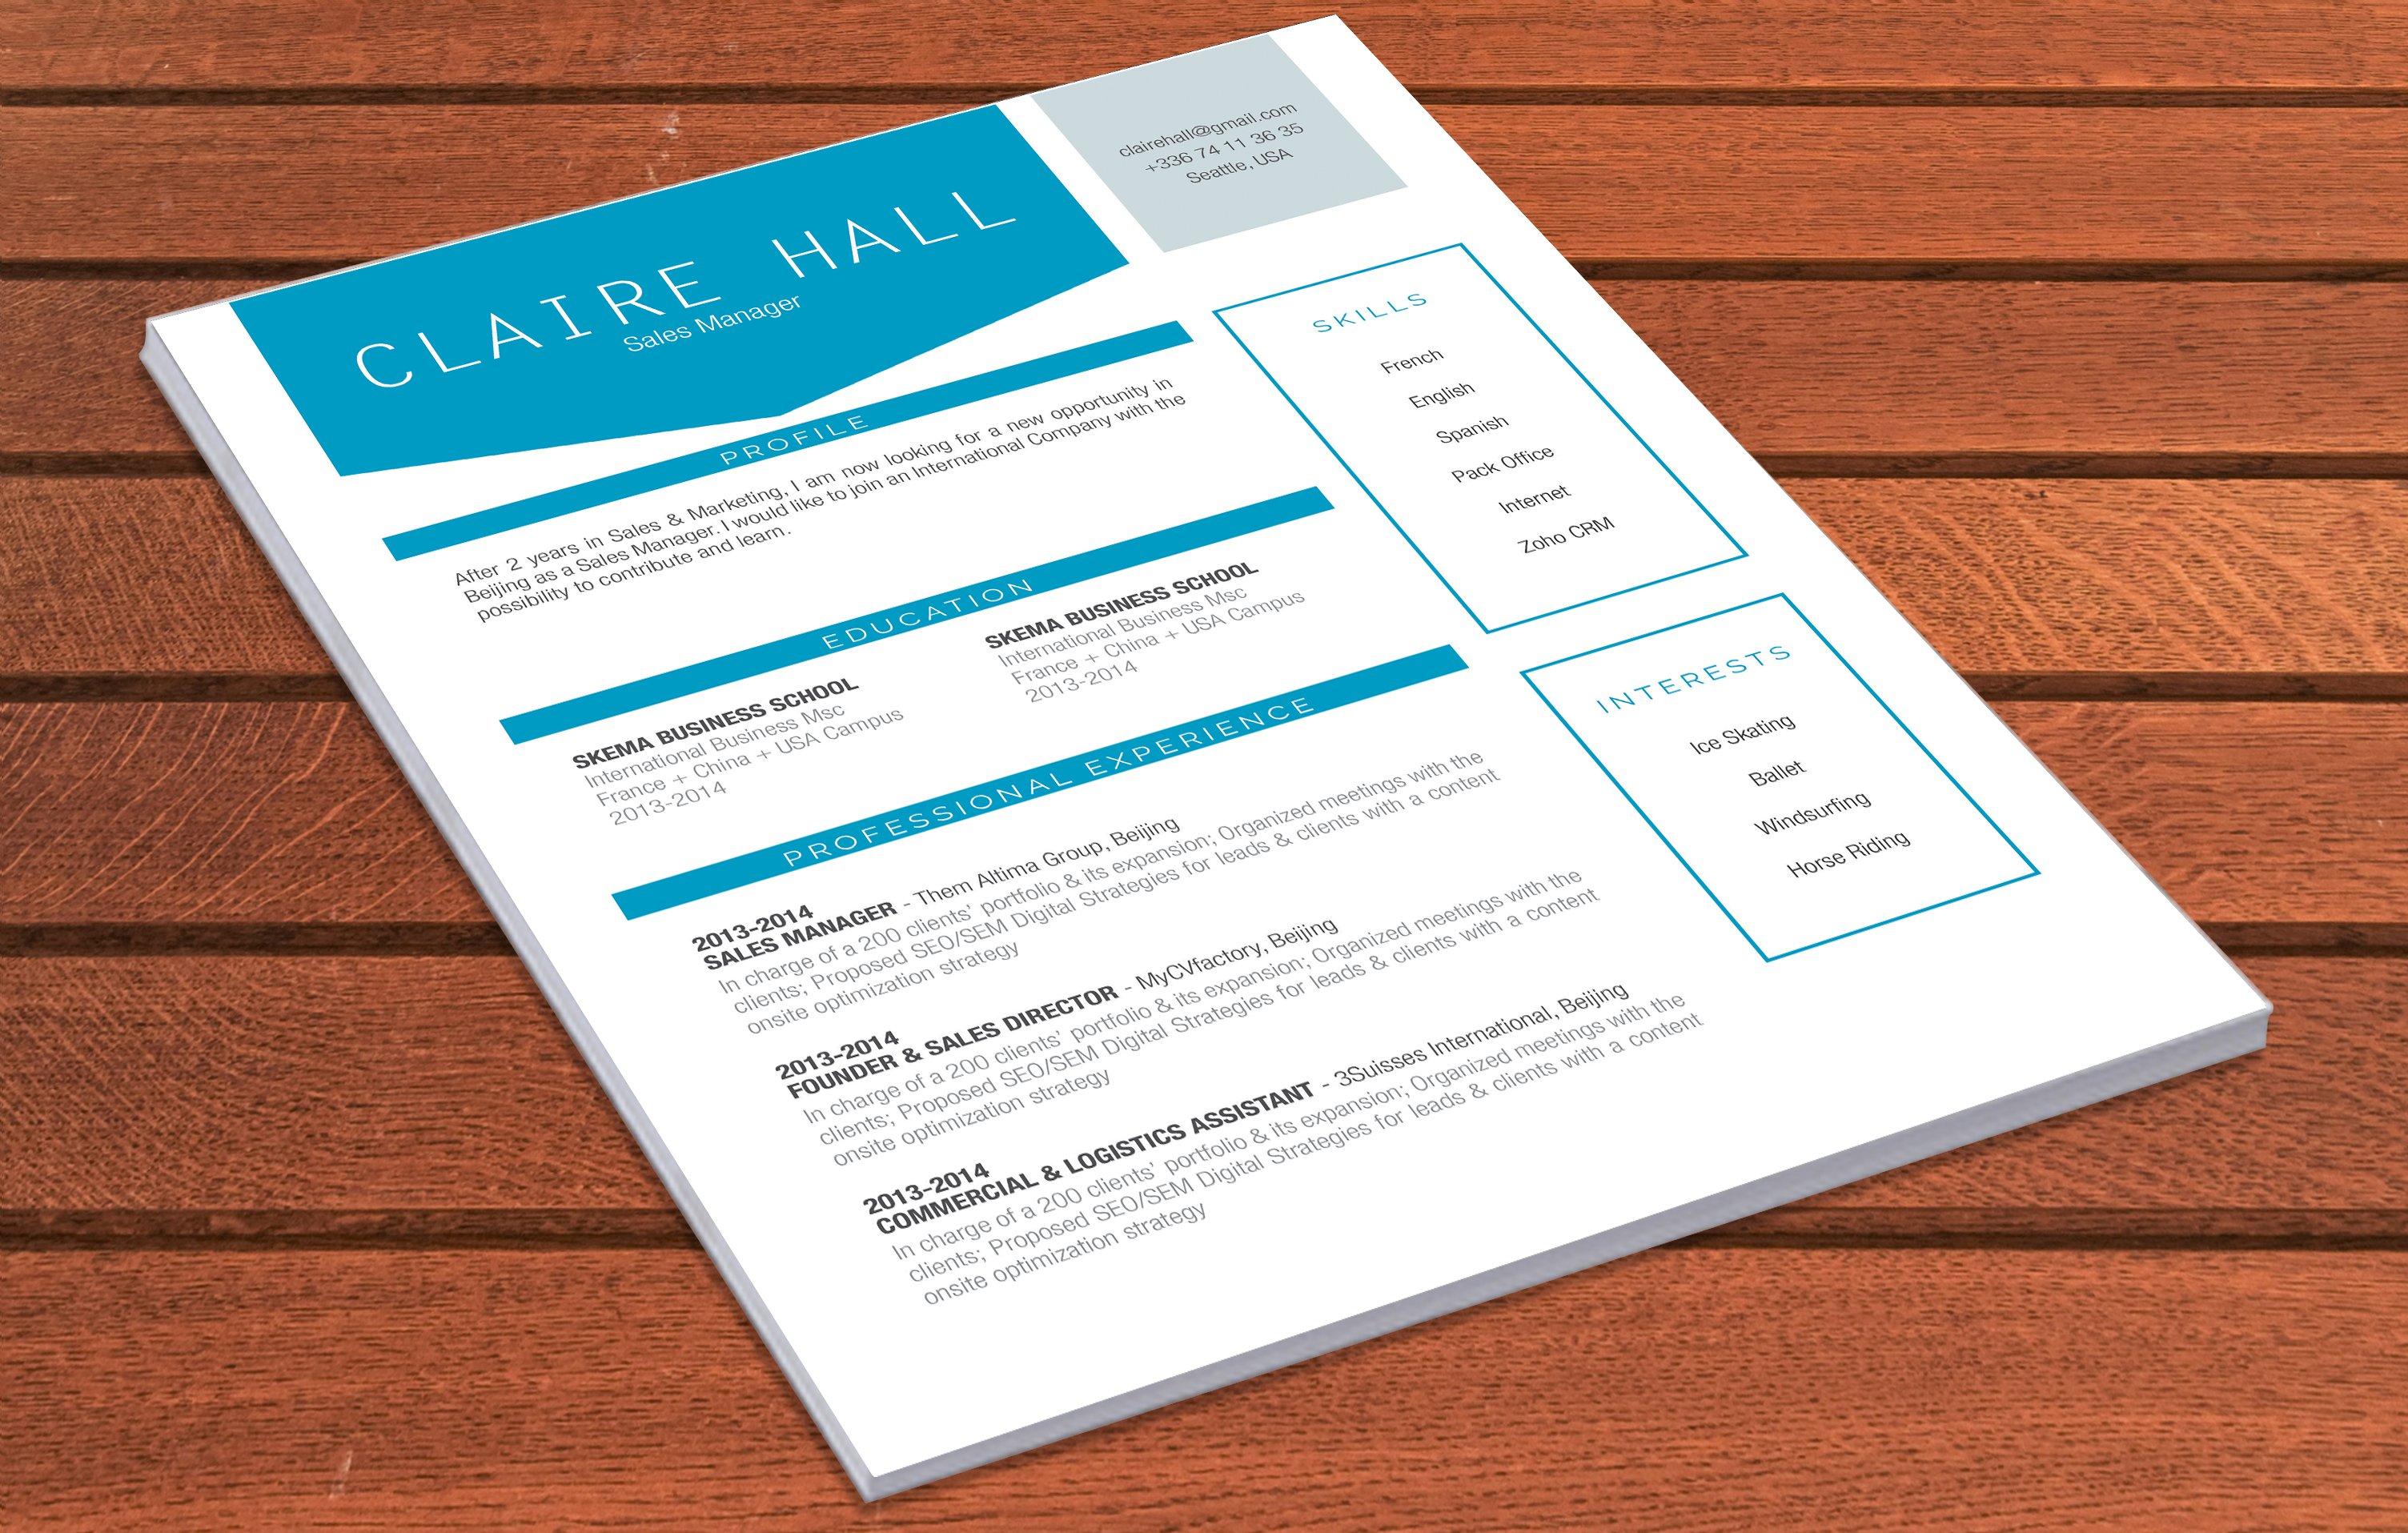 resume-builder-mycvfactory-valiant-3_dYD6pWH.jpg